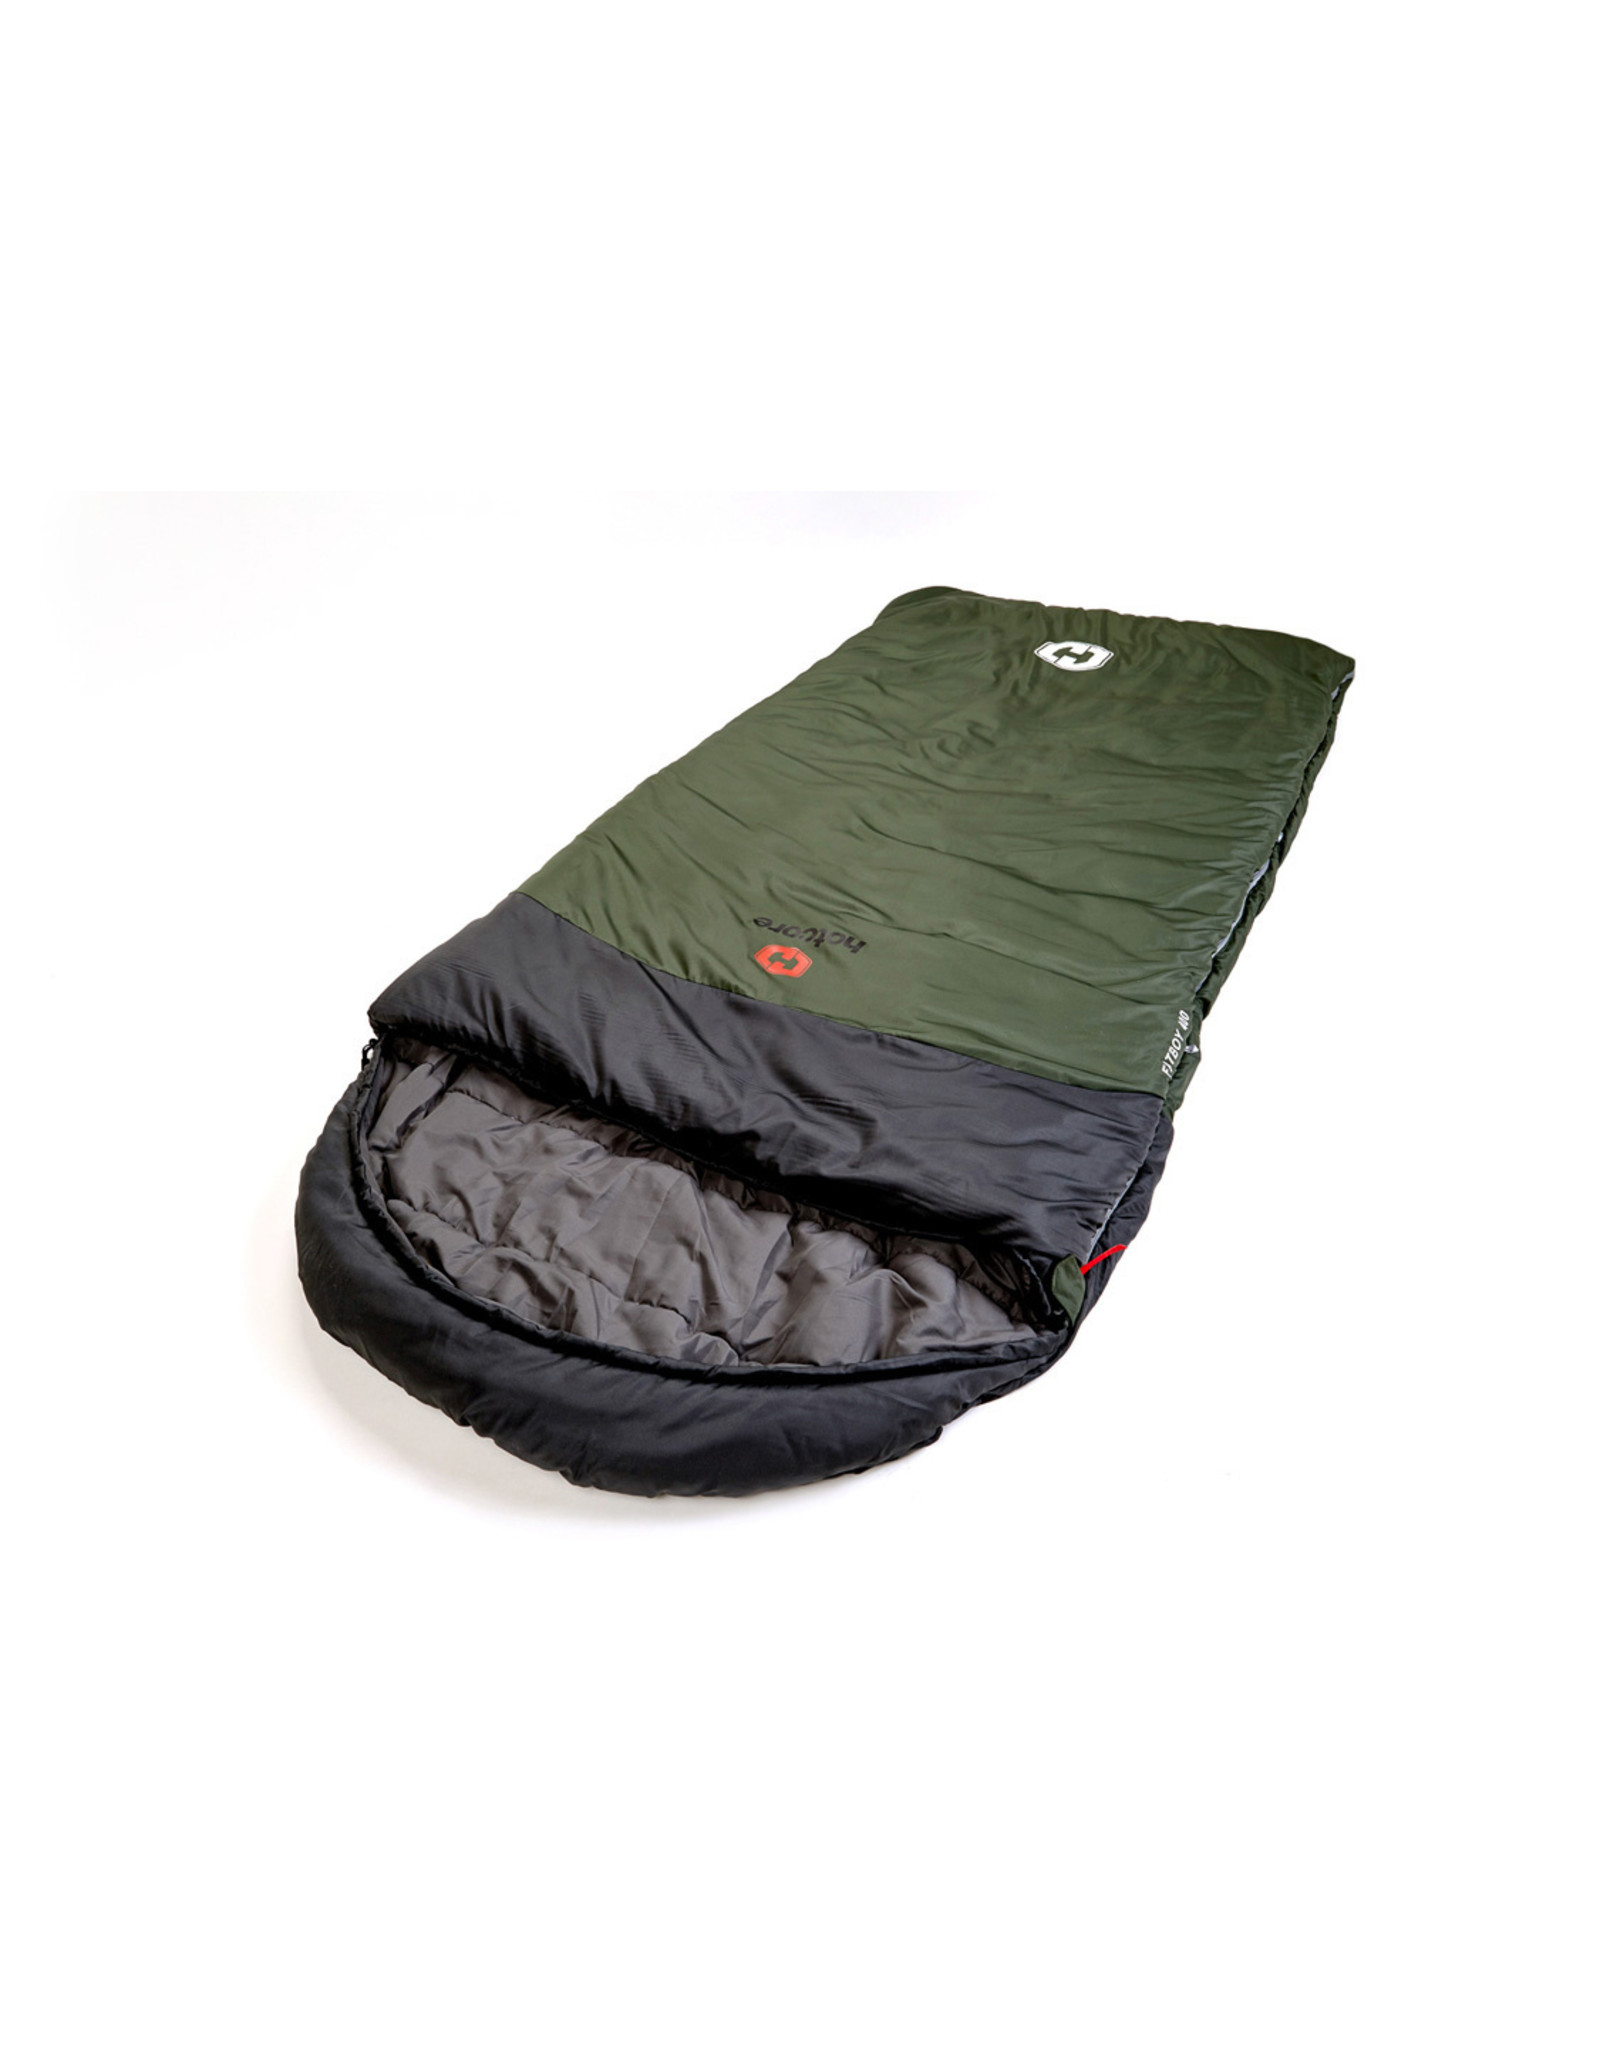 HOTCORE HOTCORE- FATBOY 400- OVERSIZED RECTANGULAR SLEEPING BAG, GREEN- 30C/-22F